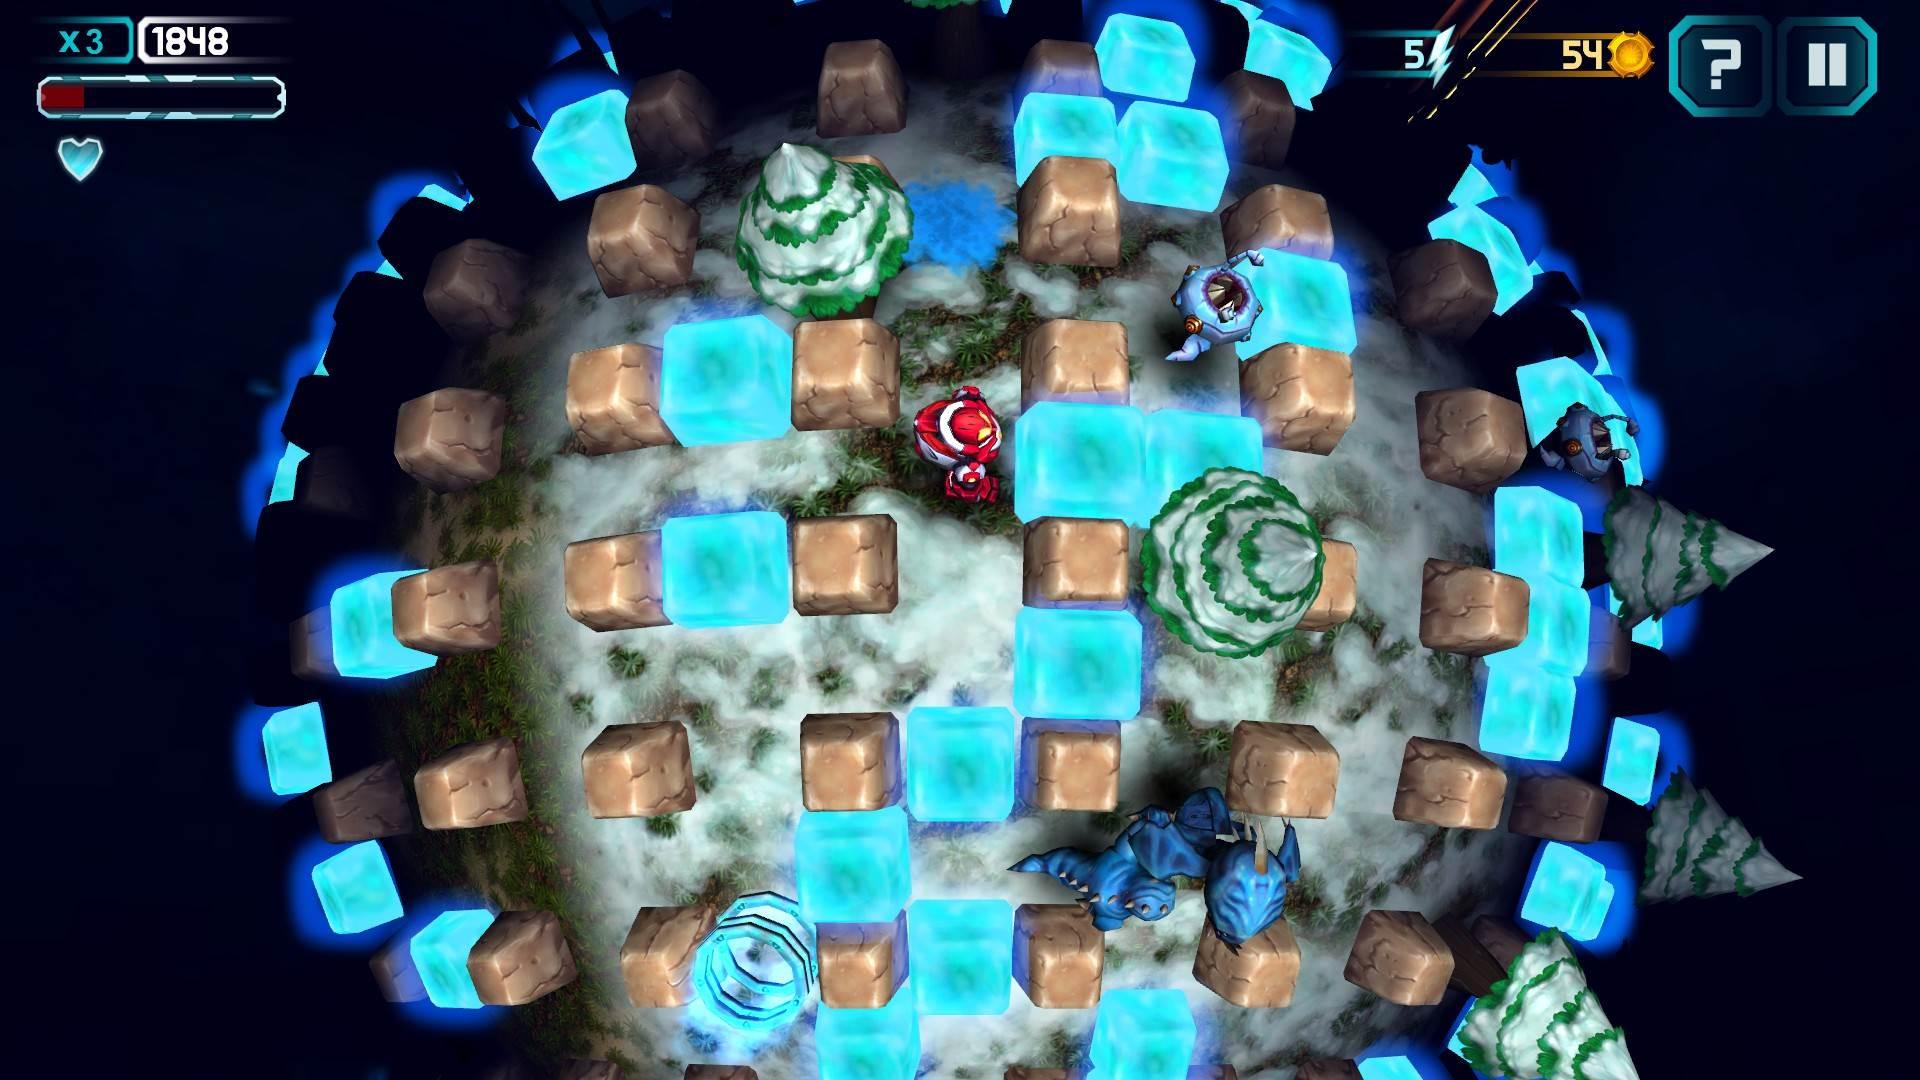 BomberZone-Review-Screenshot-03